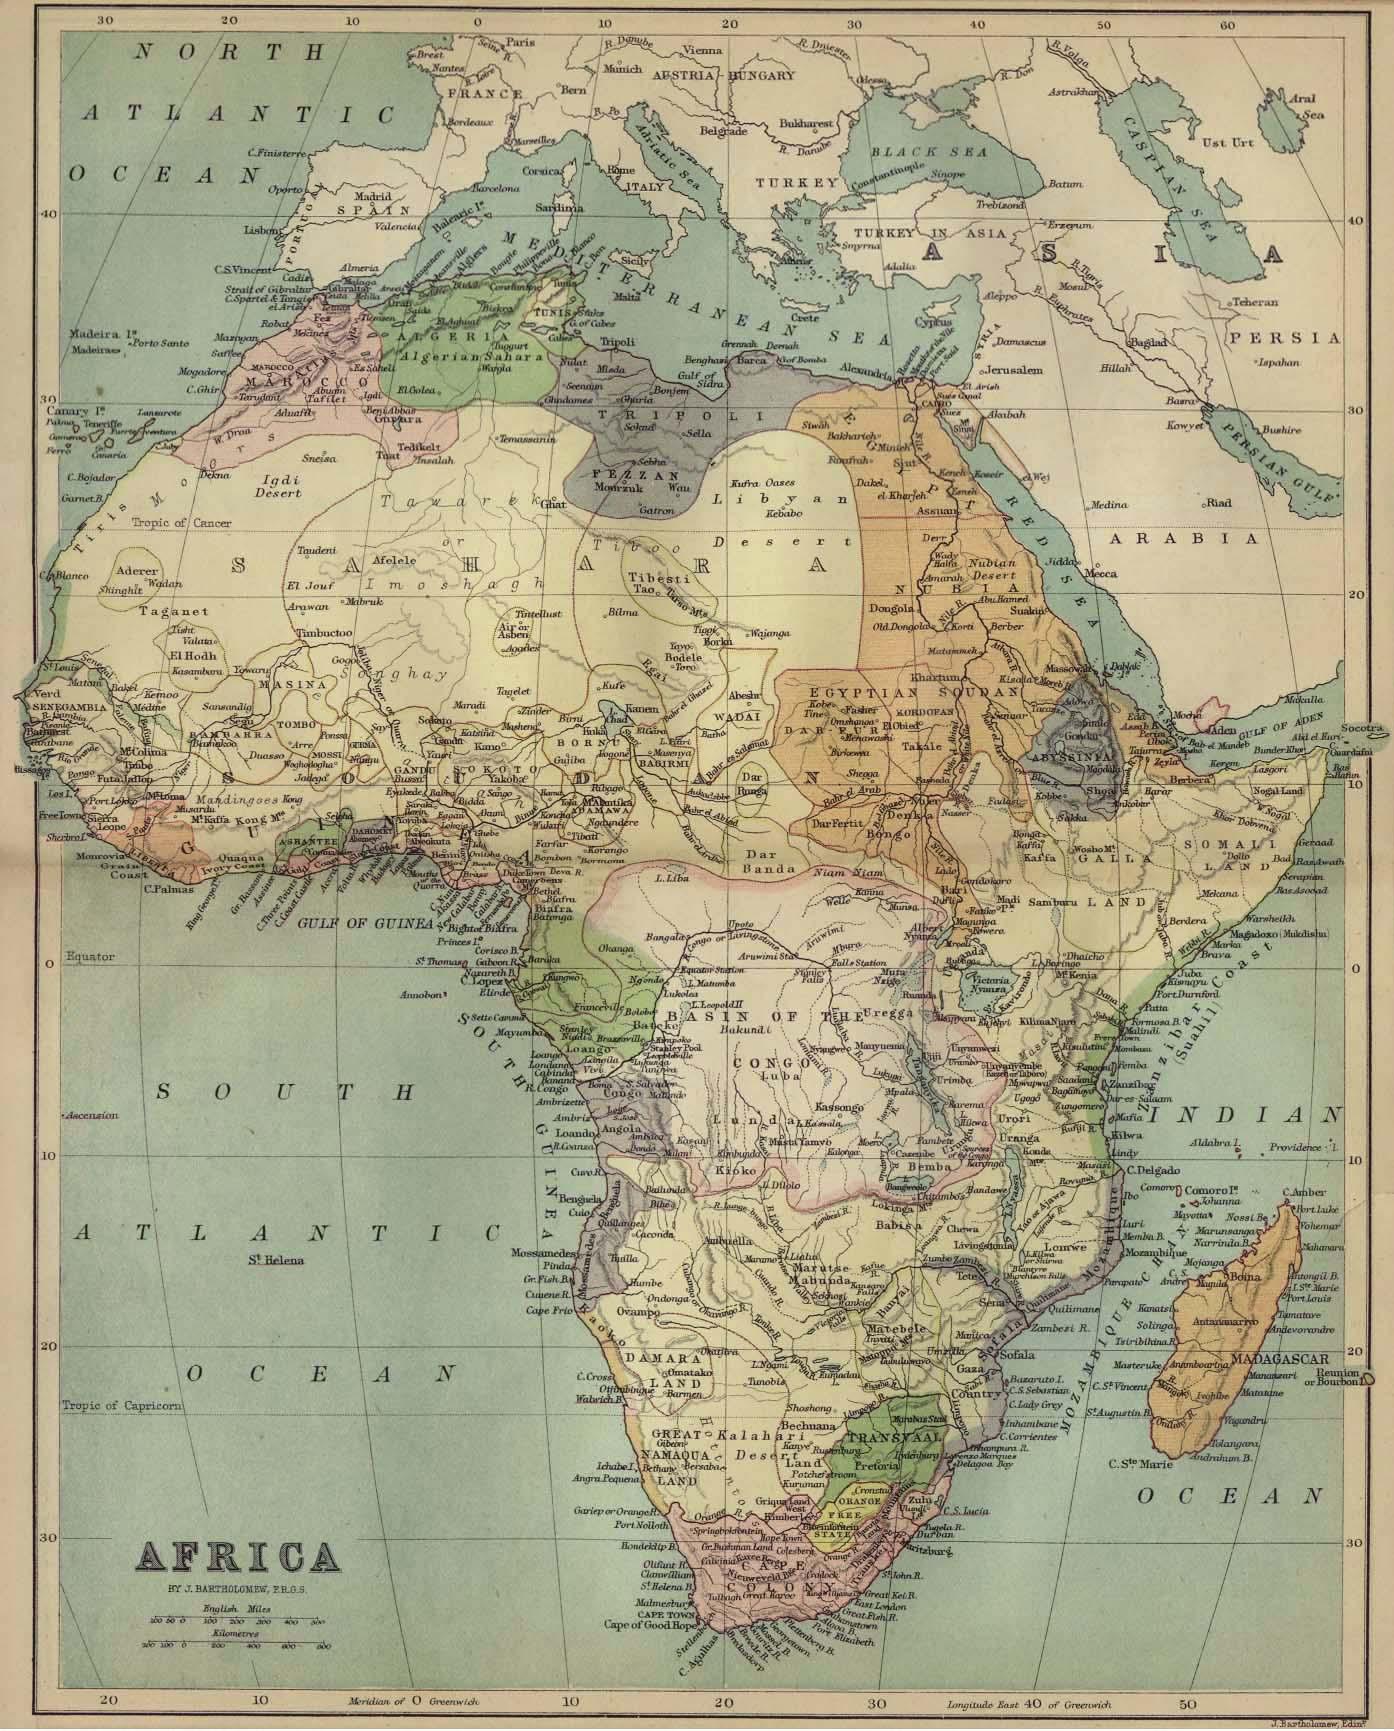 Africa Map 1885